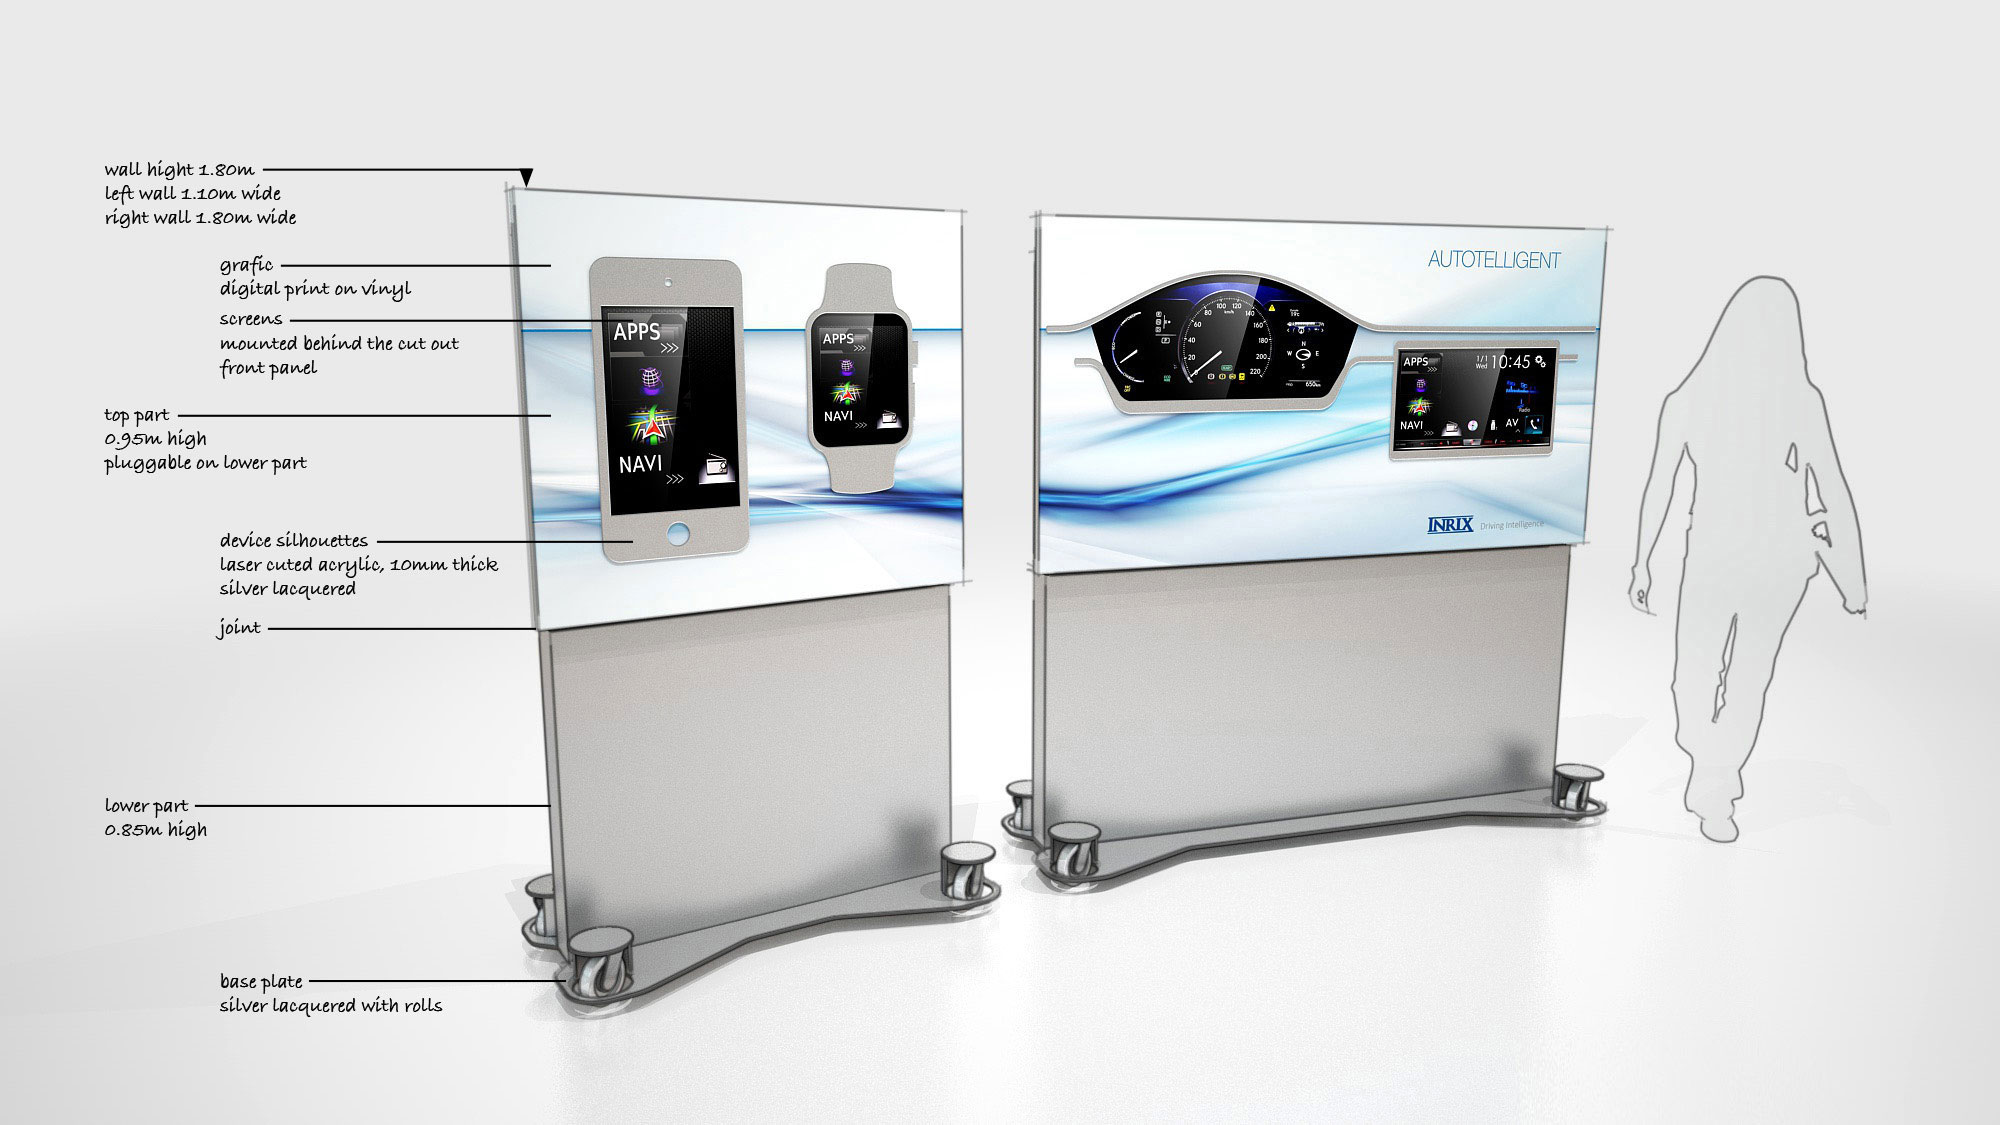 Inrix AT Display